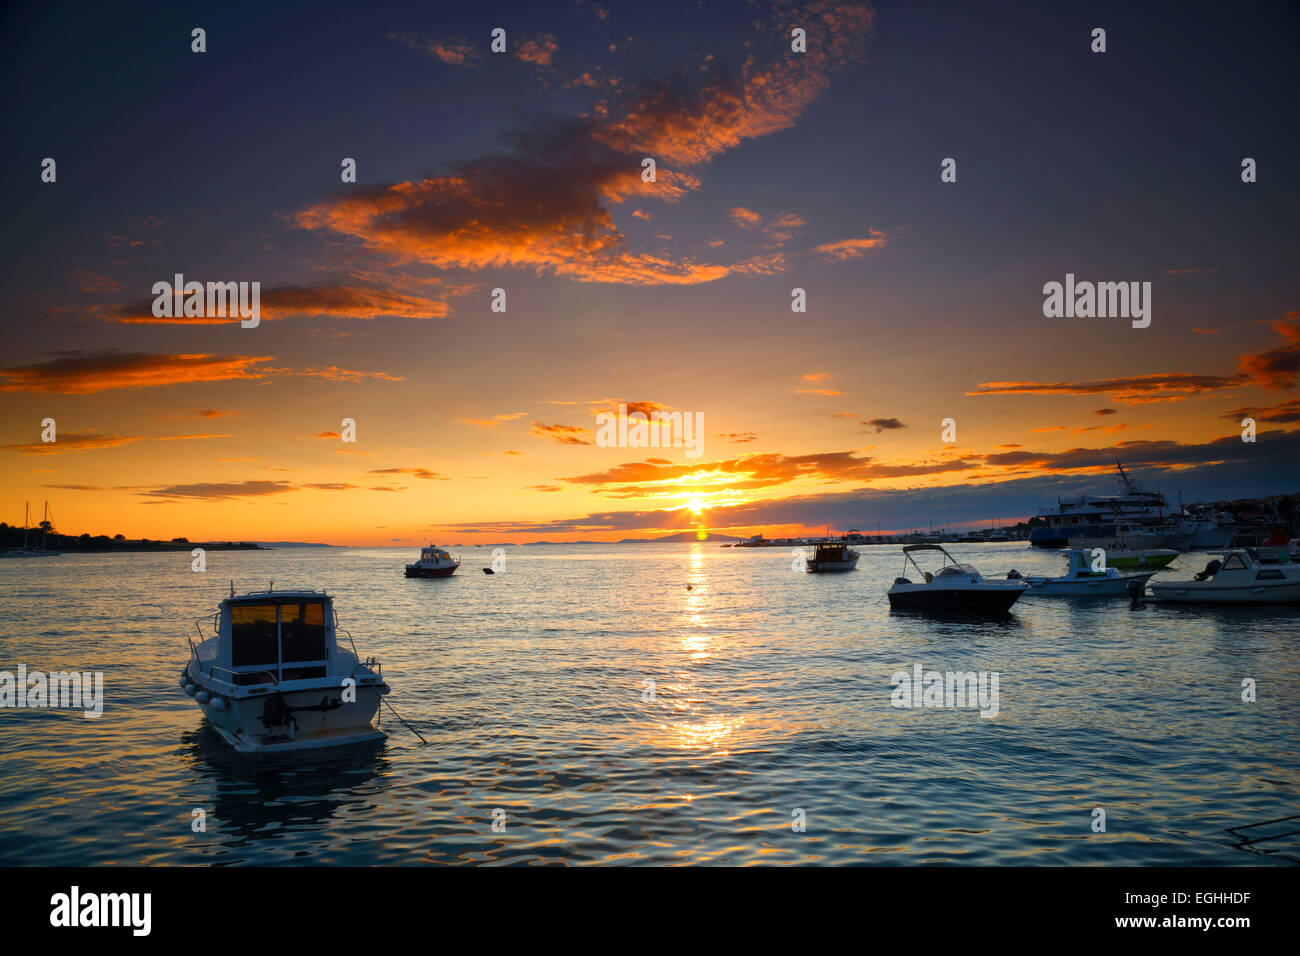 Sunset landscape, Novalja, Croatia Stock Photo